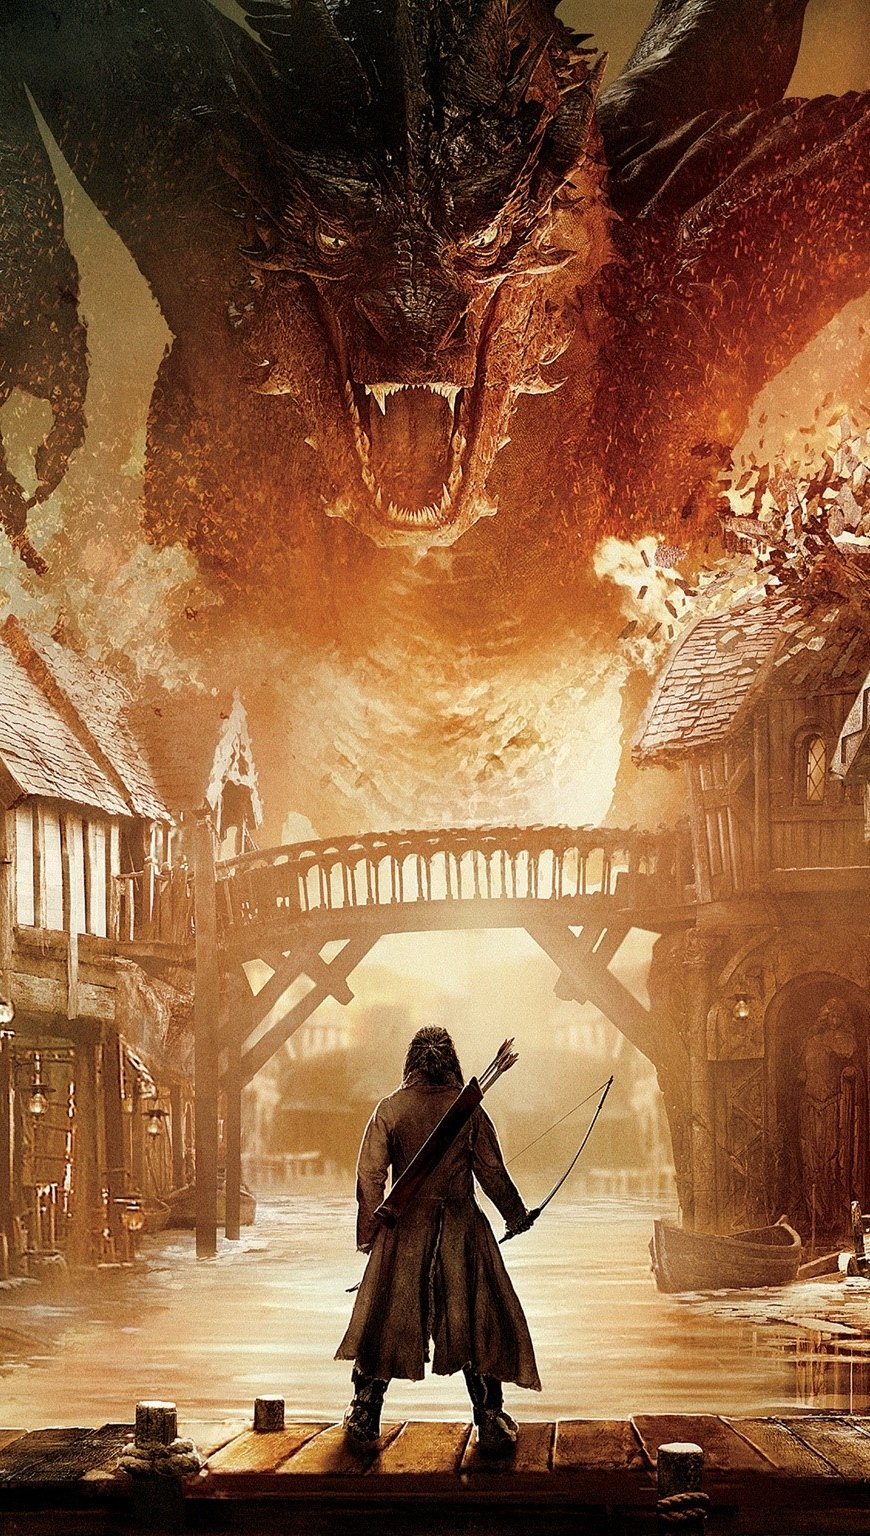 Fondos de pantalla The hobbit The battle of the five armies Vertical